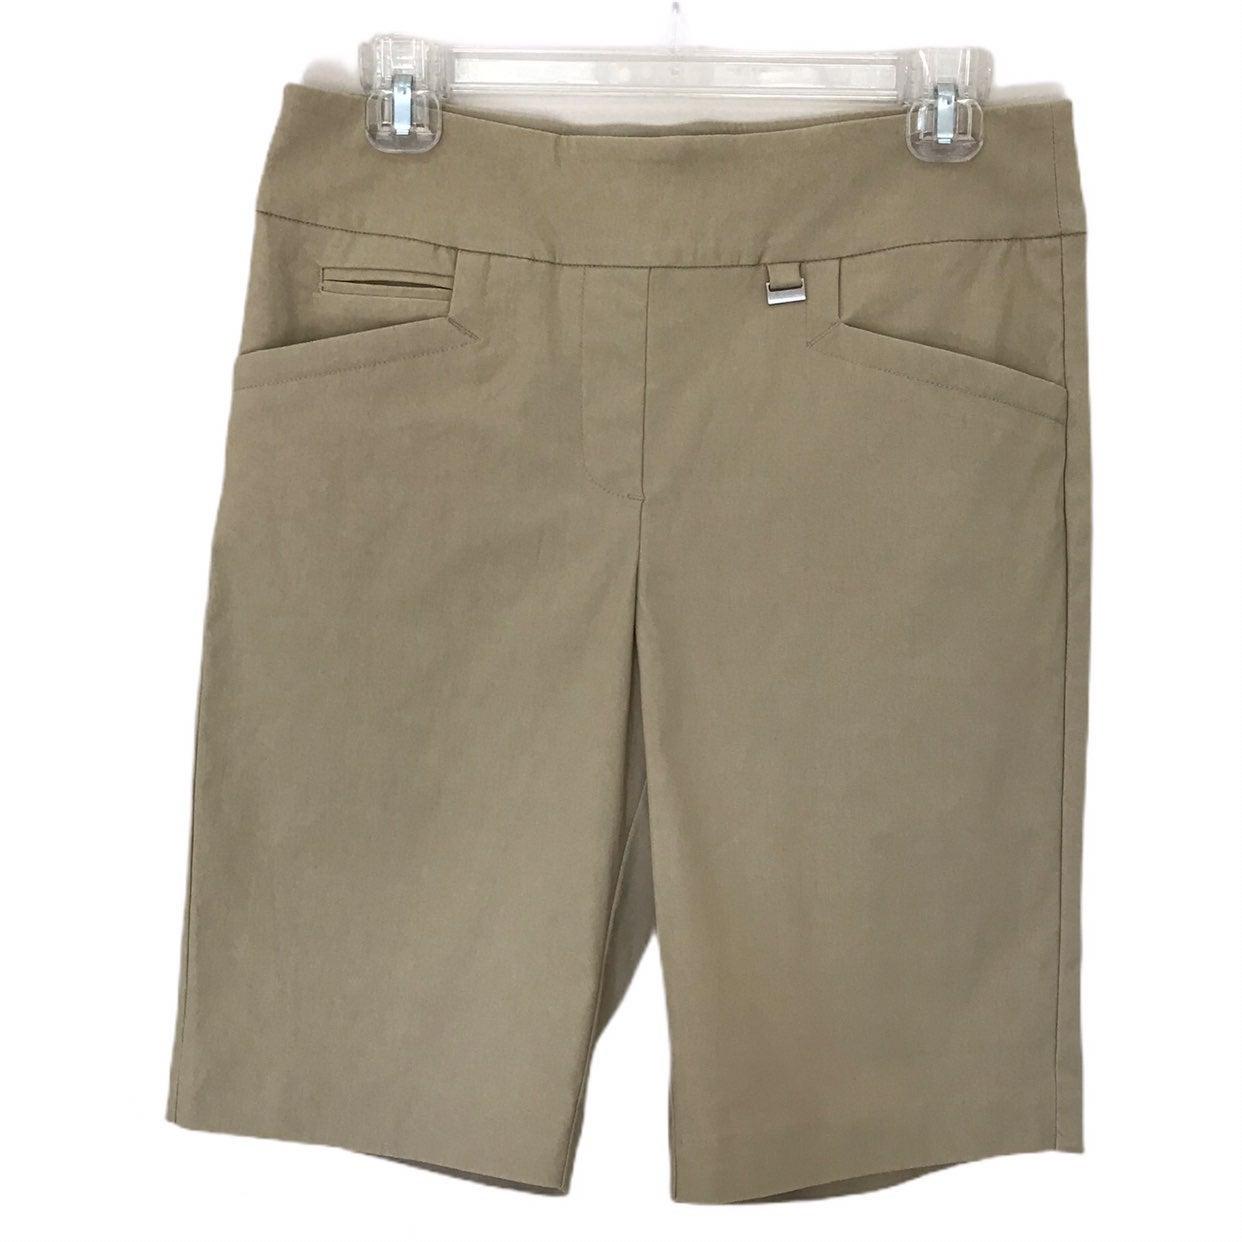 EP Pro Khaki Golf Compression Shorts